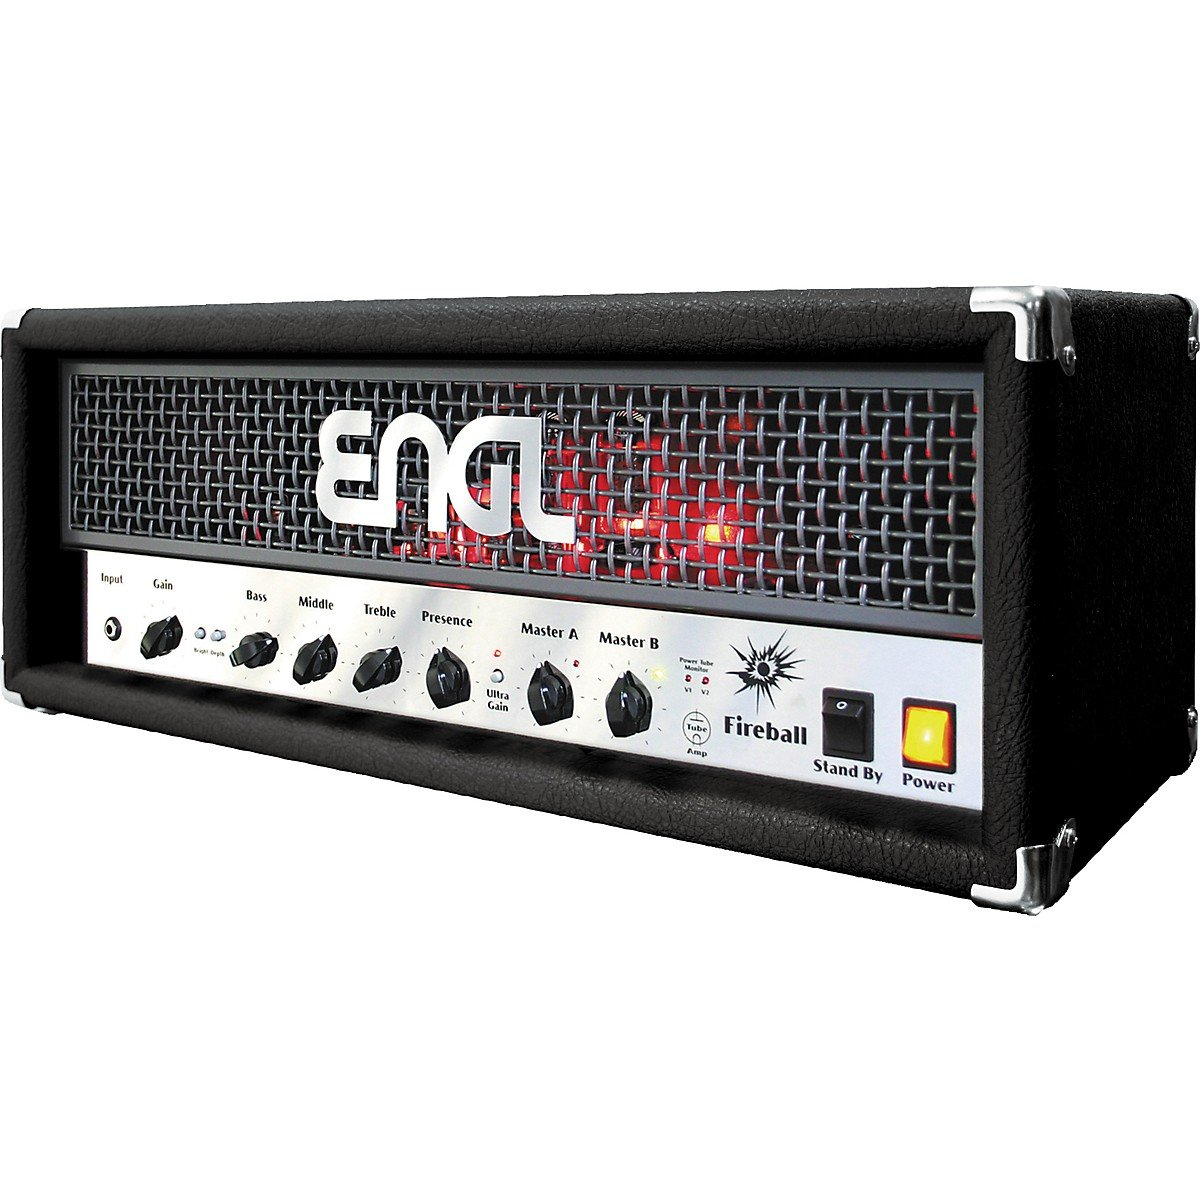 Amazoncom Engl Fireball 60 60w Tube Guitar Amp Head Black Musical Bass Amplifier Instruments